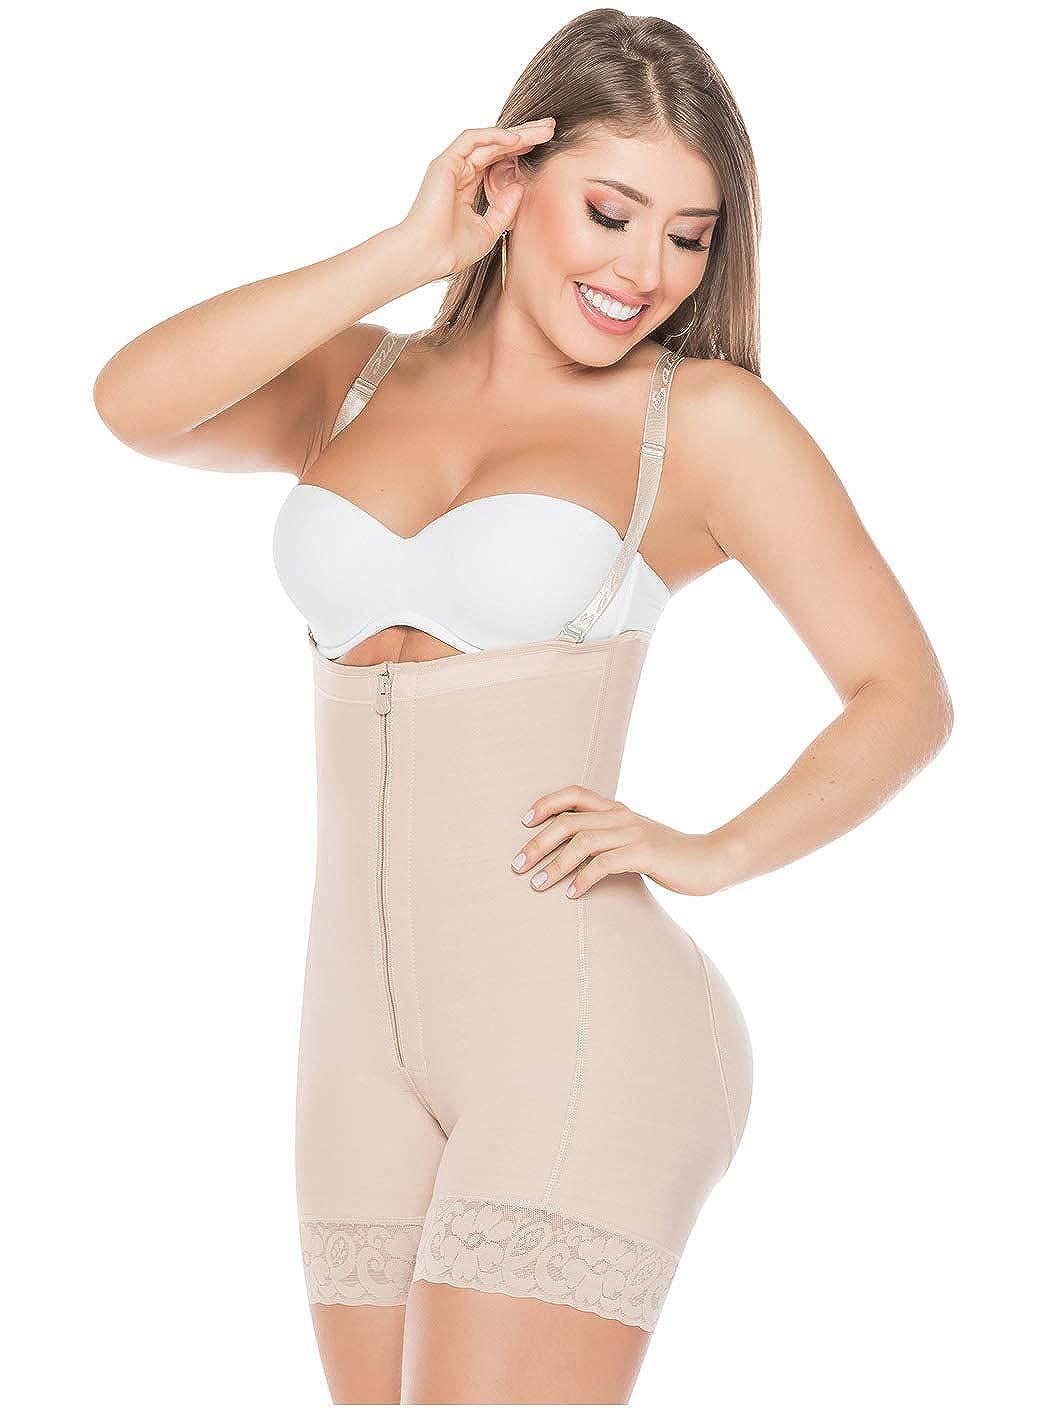 d291fecac5 Salome 0215 Women Strapless Bodysuit Shaper Fajas Reductoras y Moldeadoras  at Amazon Women s Clothing store